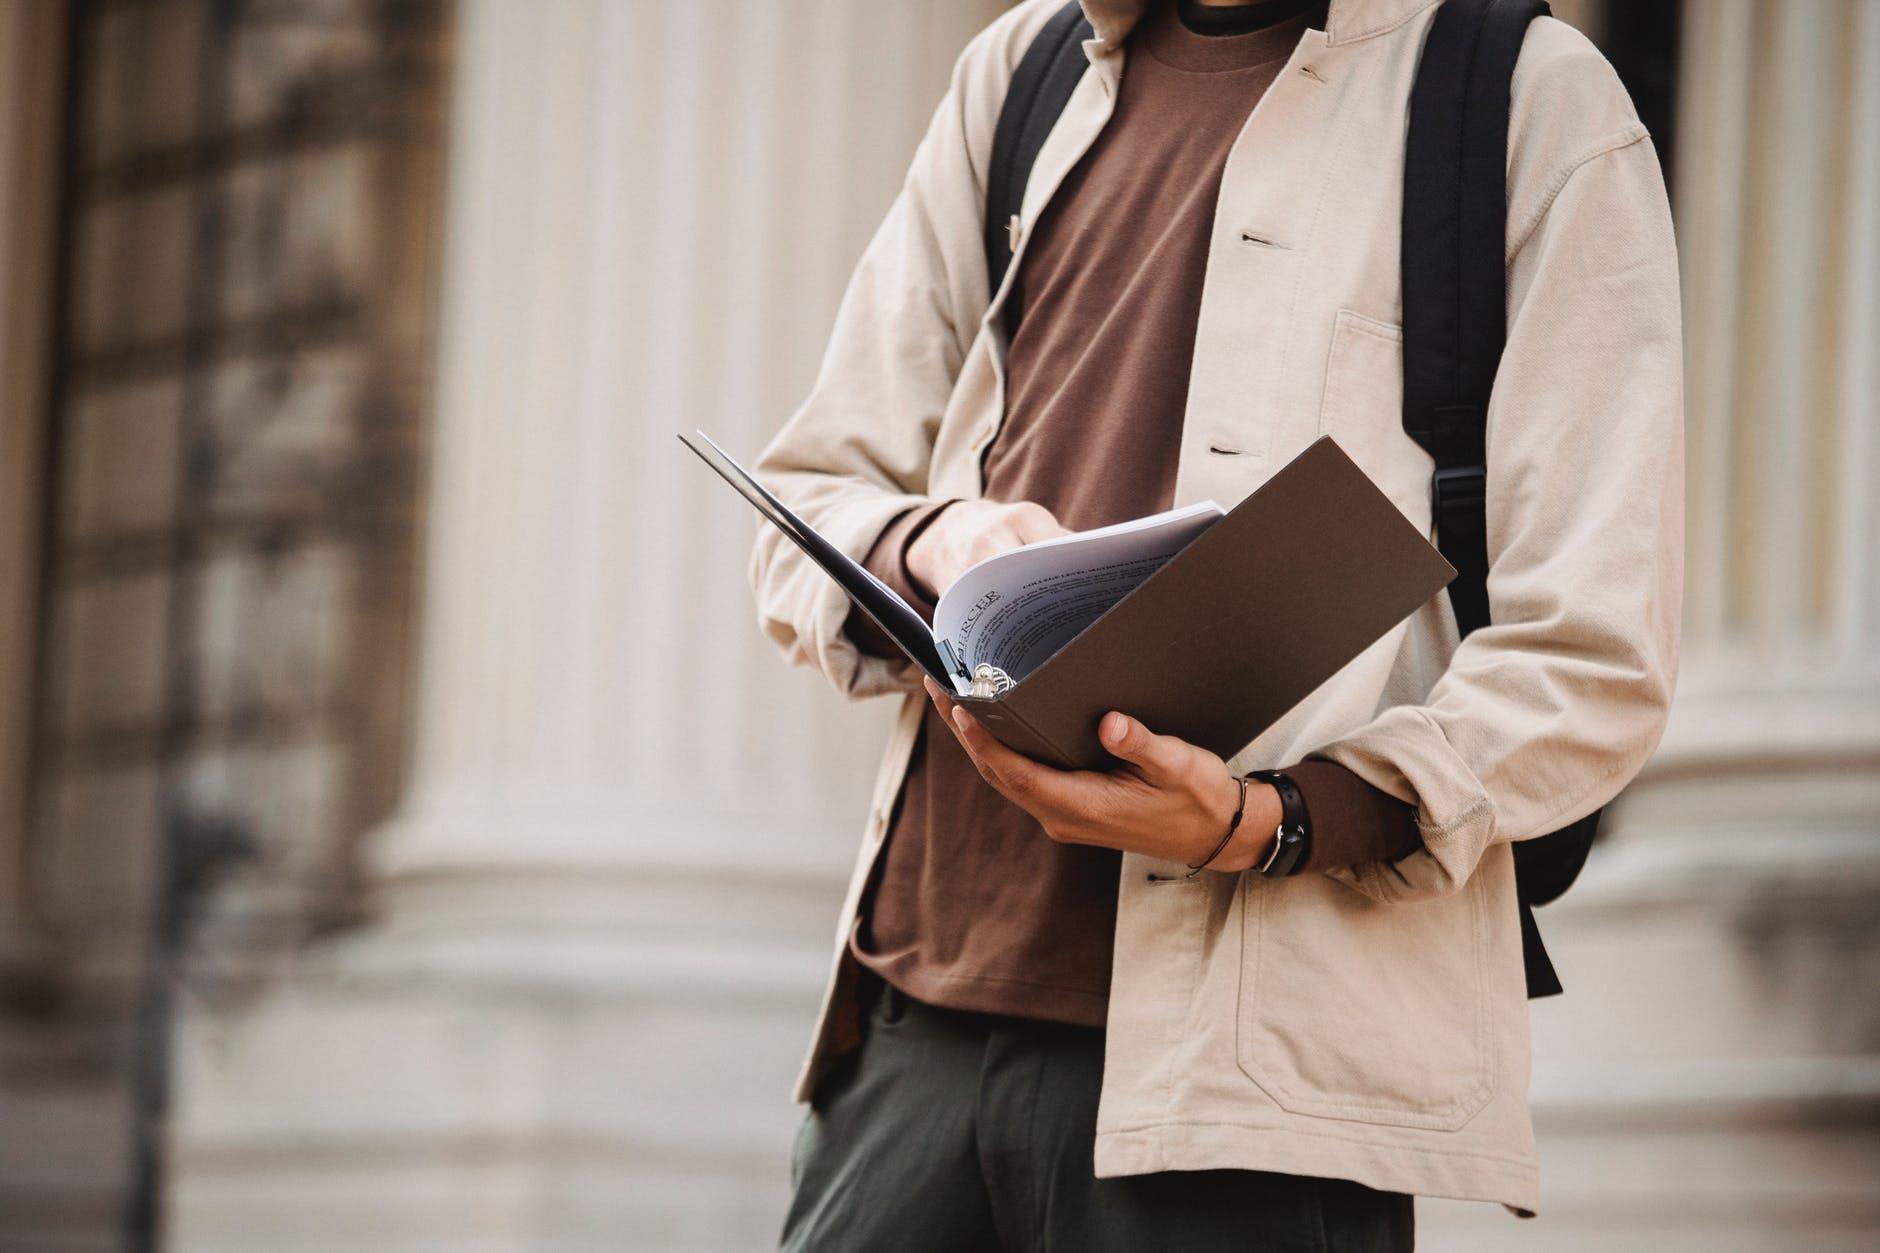 student reading documents in folder outside university